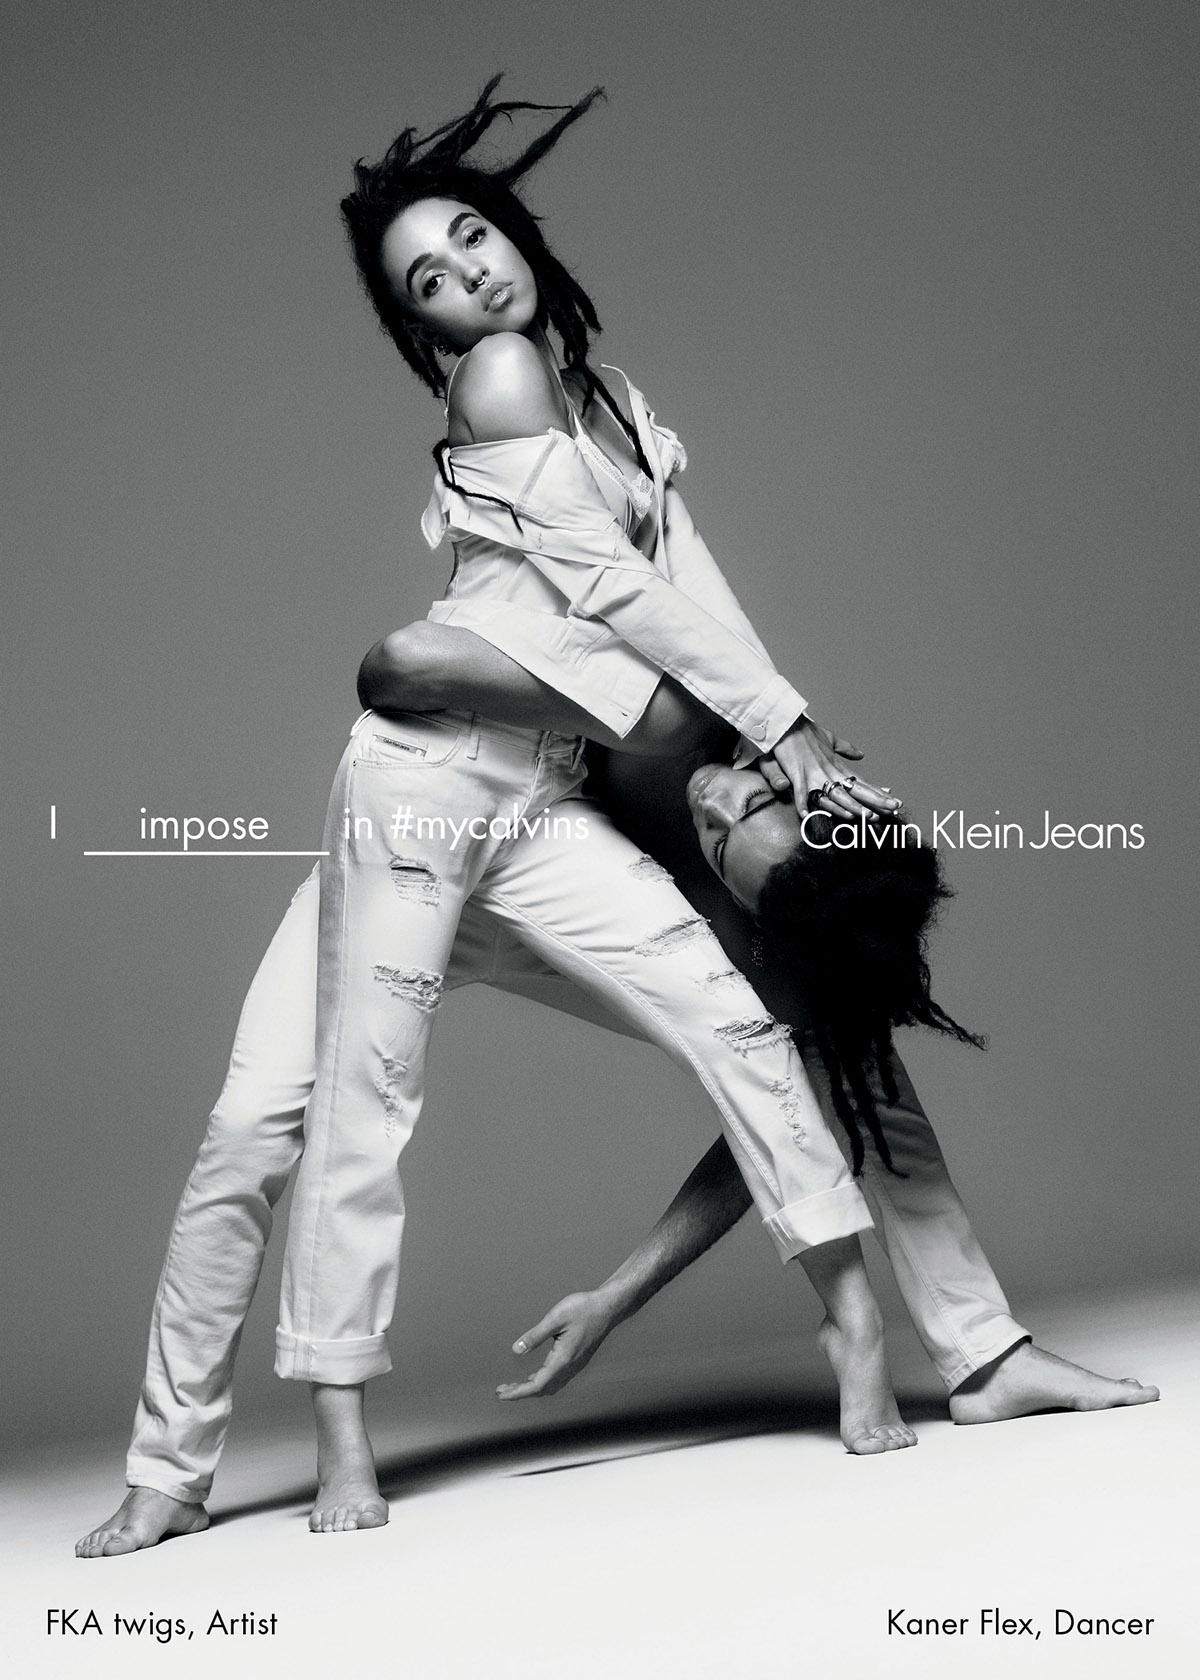 calvin-klein-jeans-s16-campaign_ph_david-sims-007